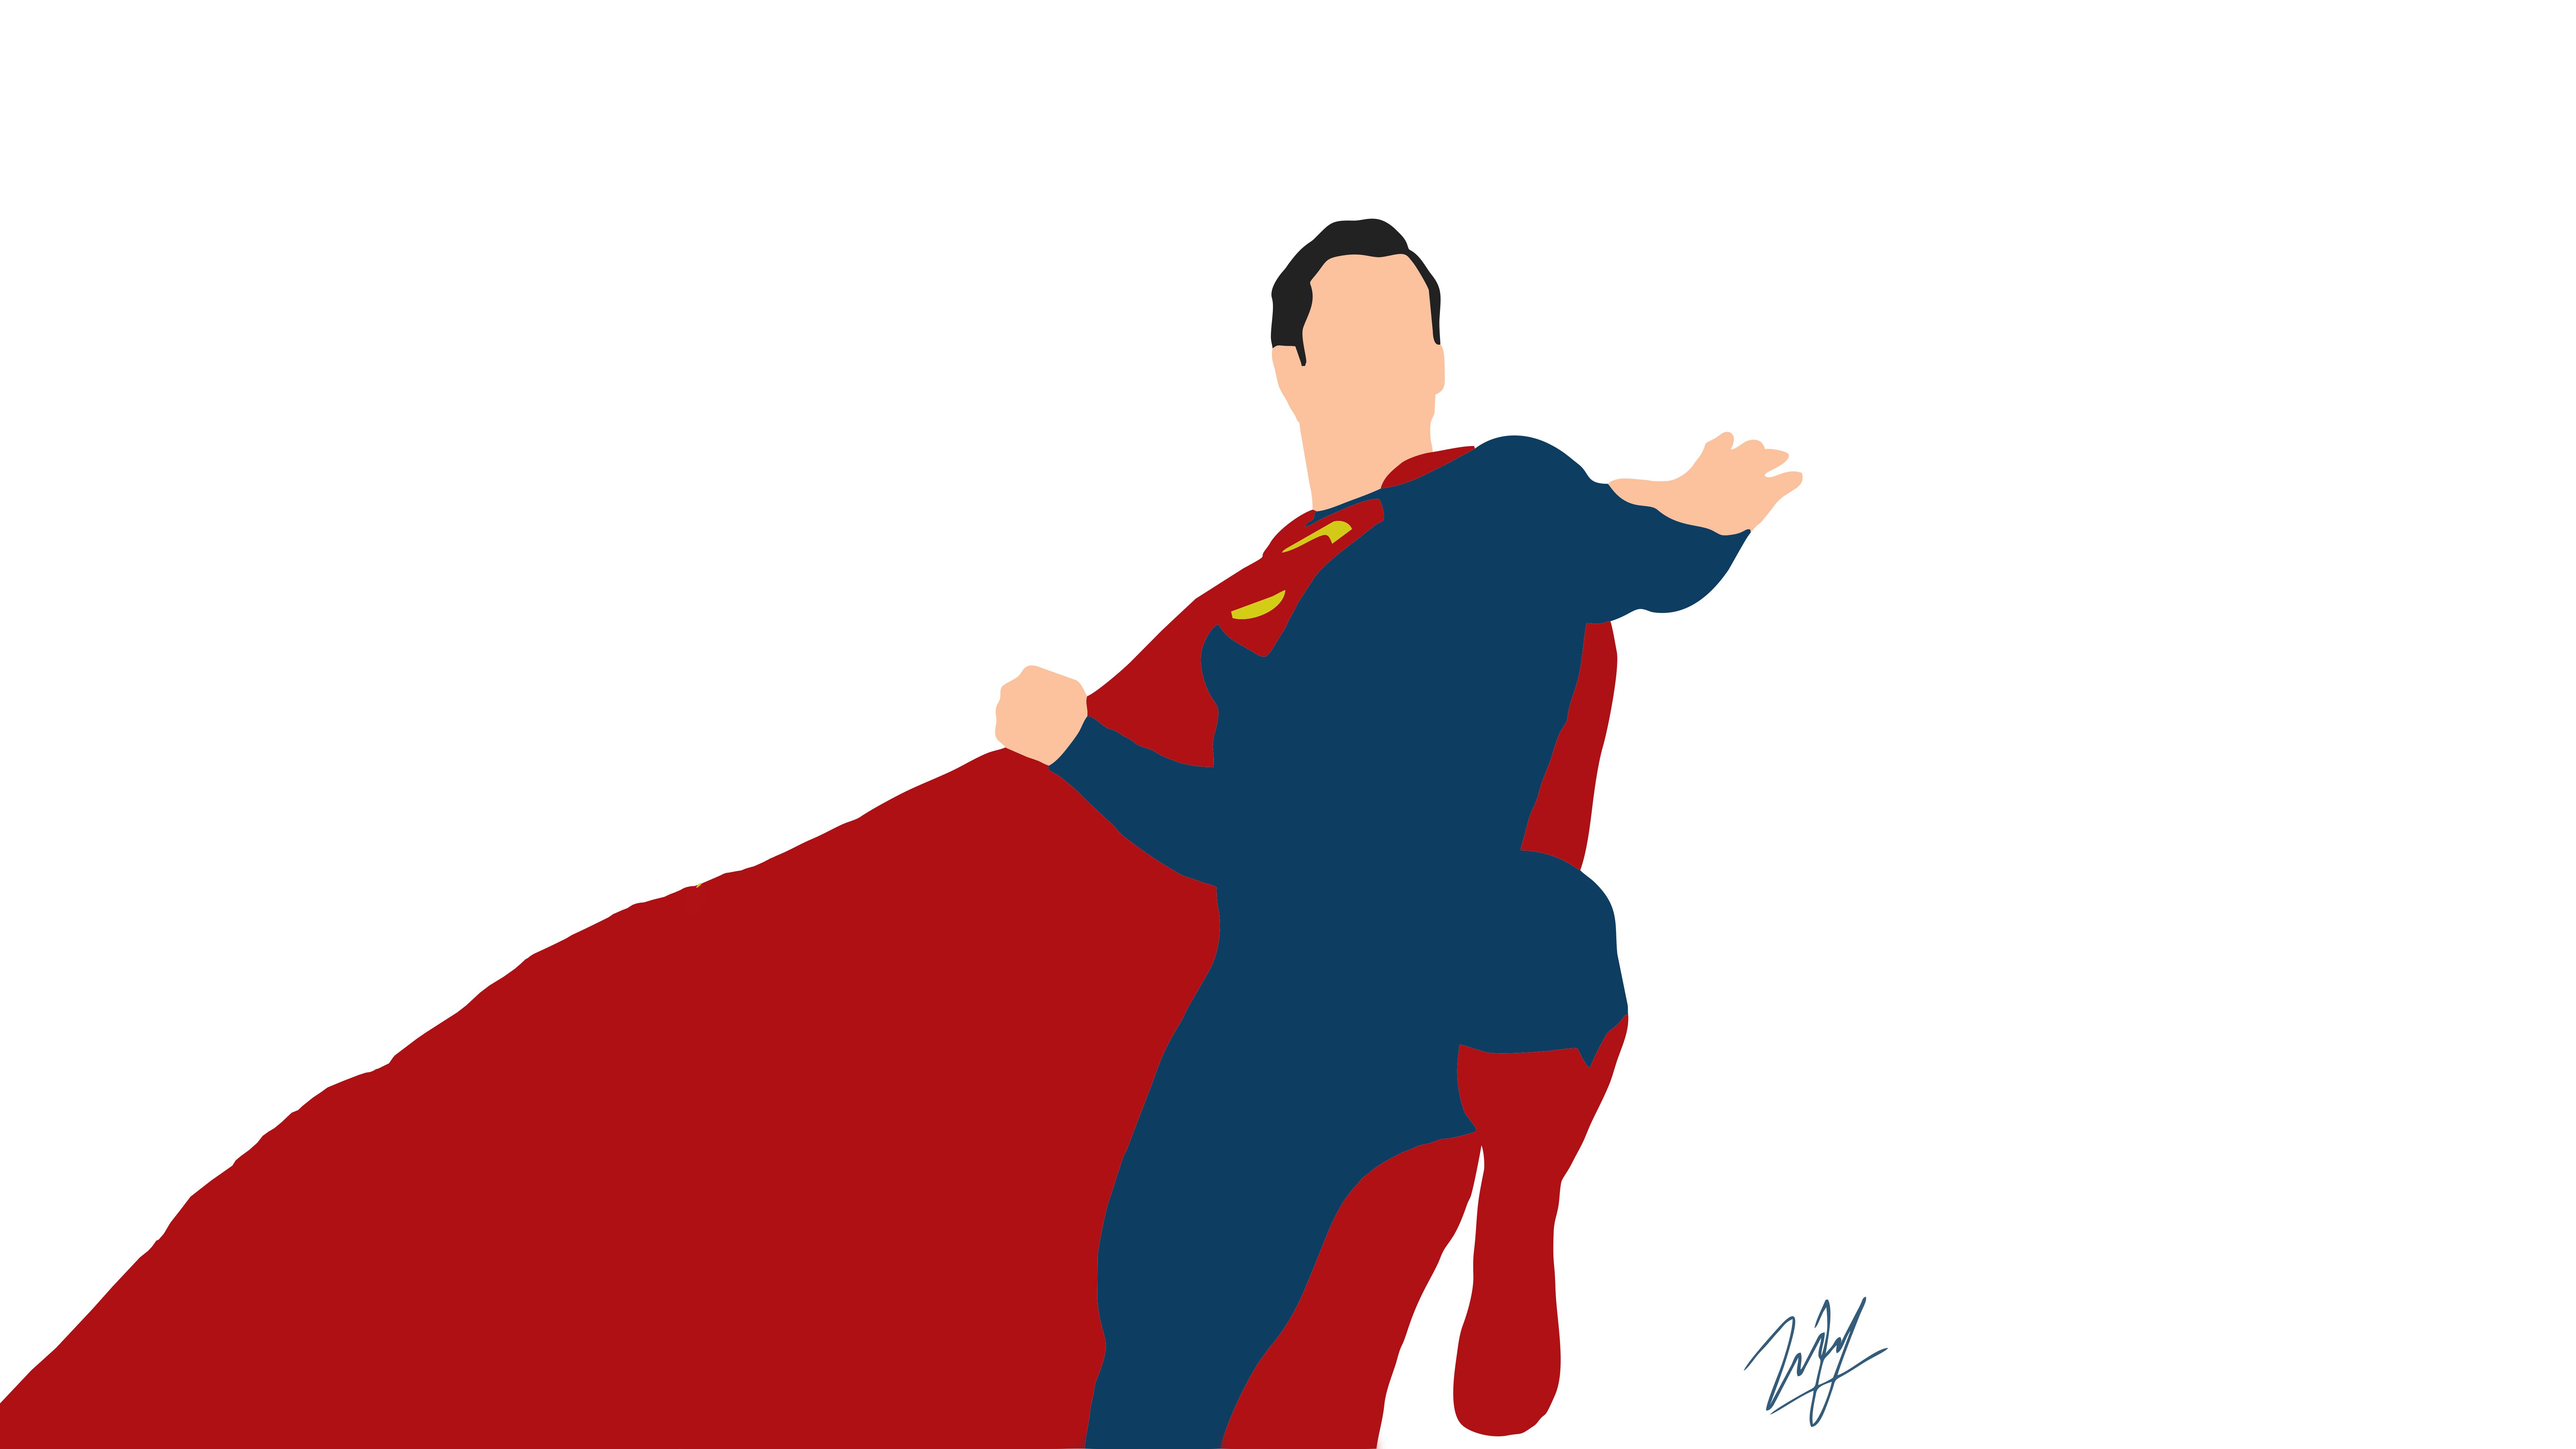 1080x1920 Daredevil Minimalism Iphone 7 6s 6 Plus Pixel: 1080x1920 Superman Justice League Minimalism Iphone 7,6s,6